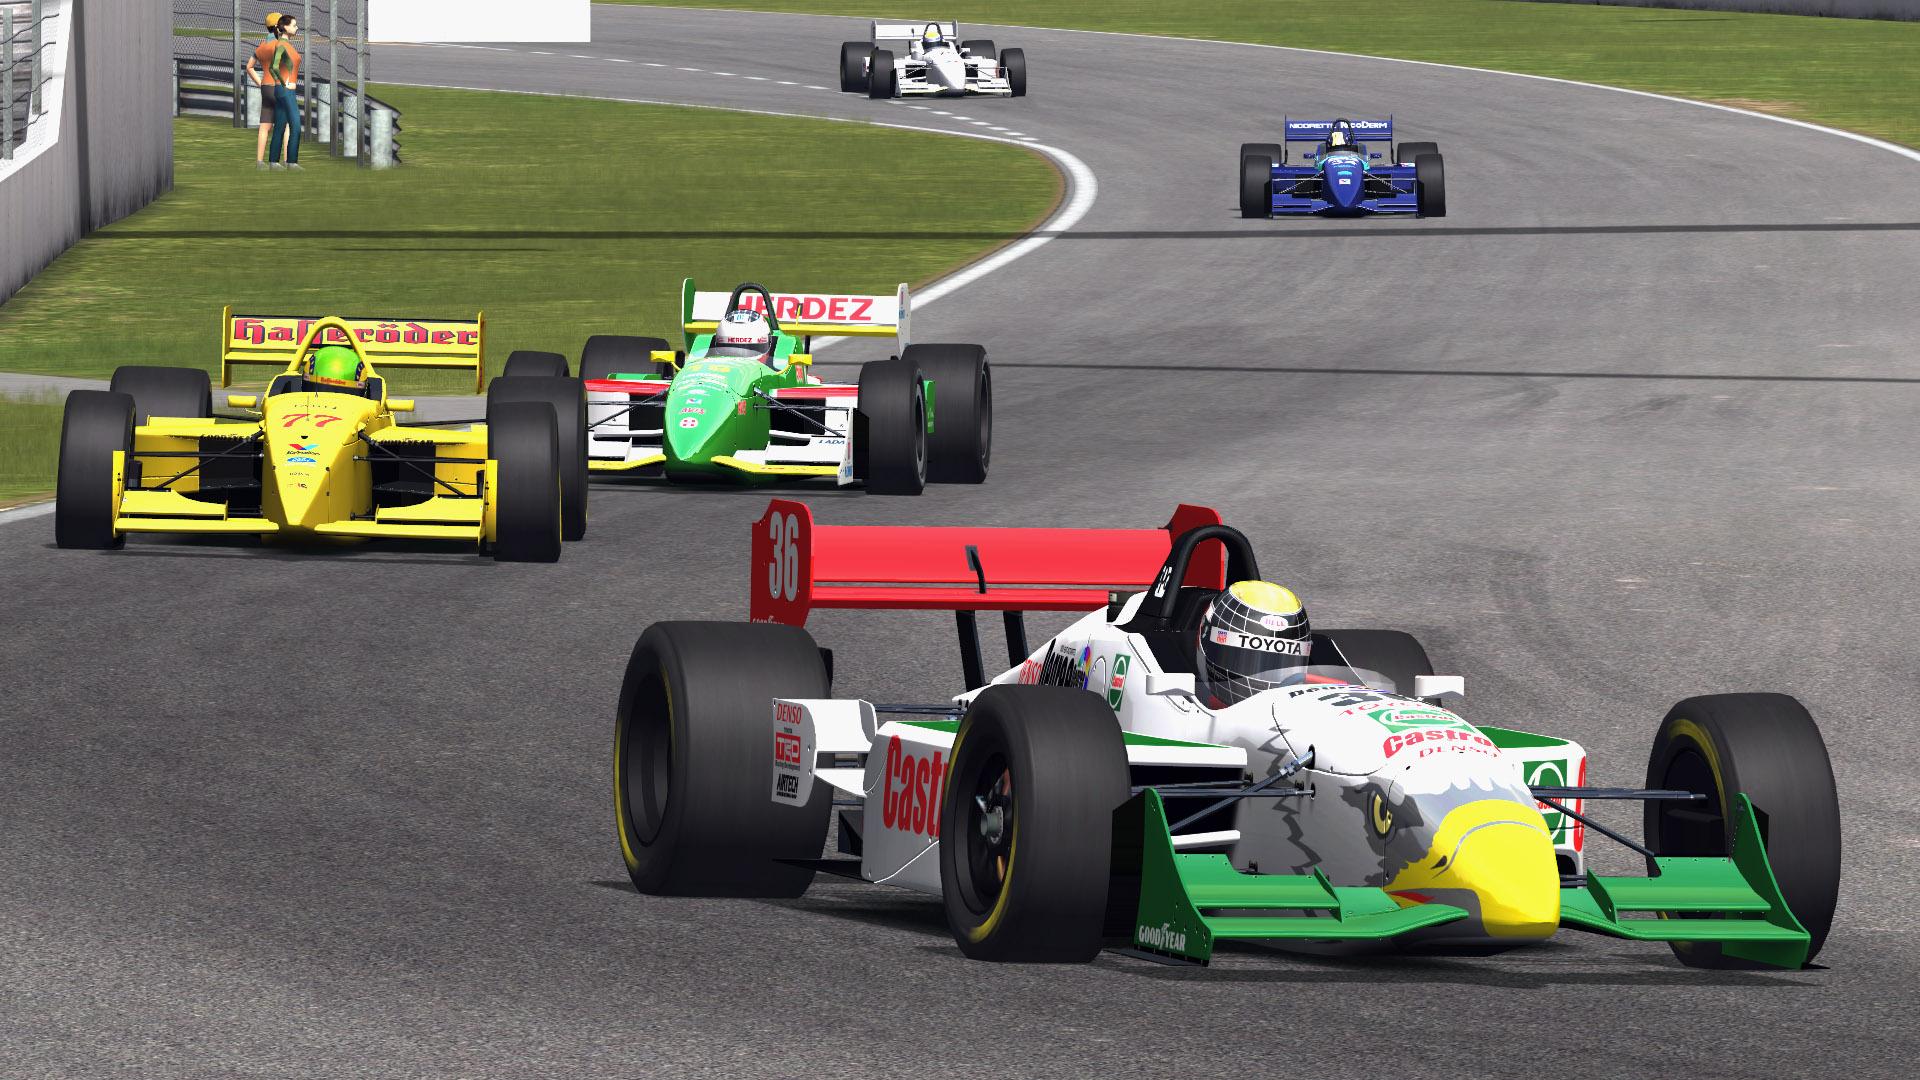 Dirt Car Racing Wallpaper Cart Factor For Game Stock Car Previews Virtualr Net